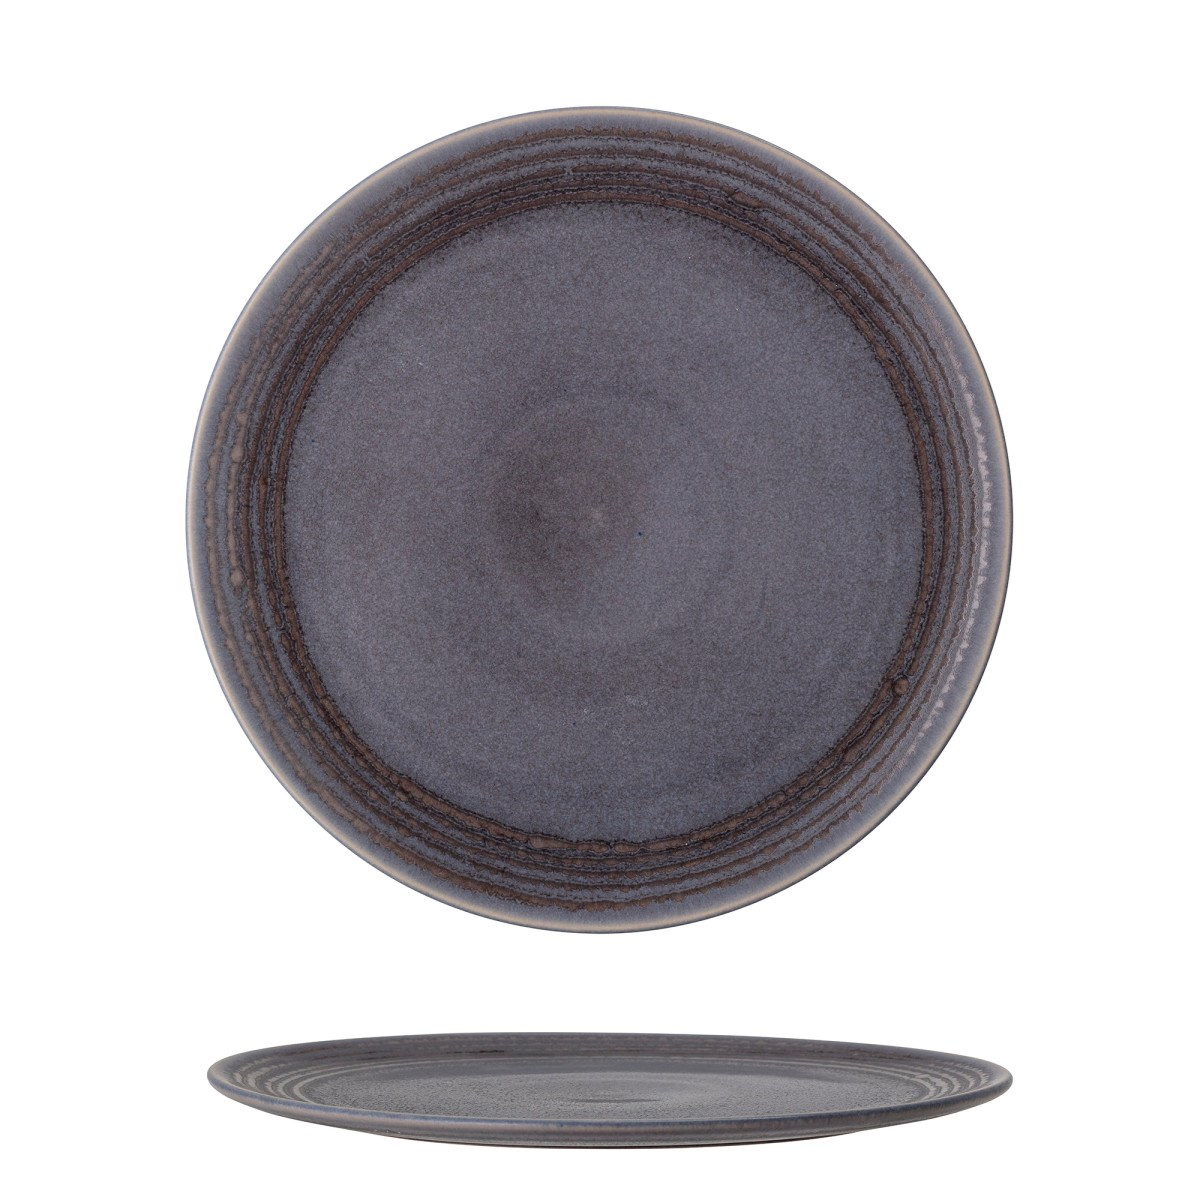 Talíř Raben 30 cm šedý kameninový_1